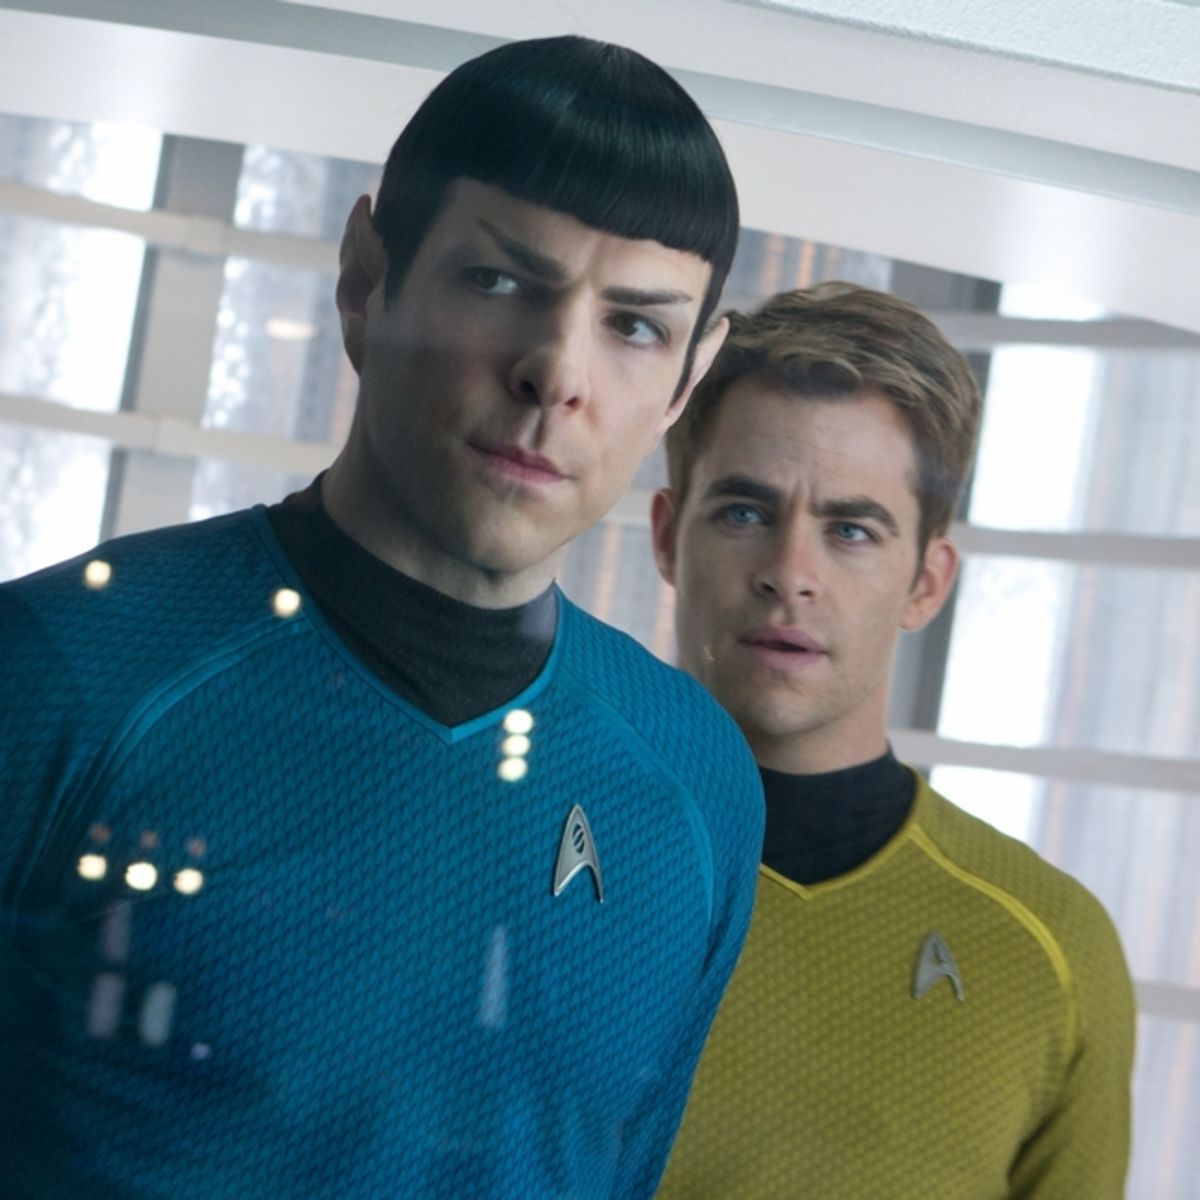 Quinto-Pine-Star-Trek-into-Darkness-1.jpg